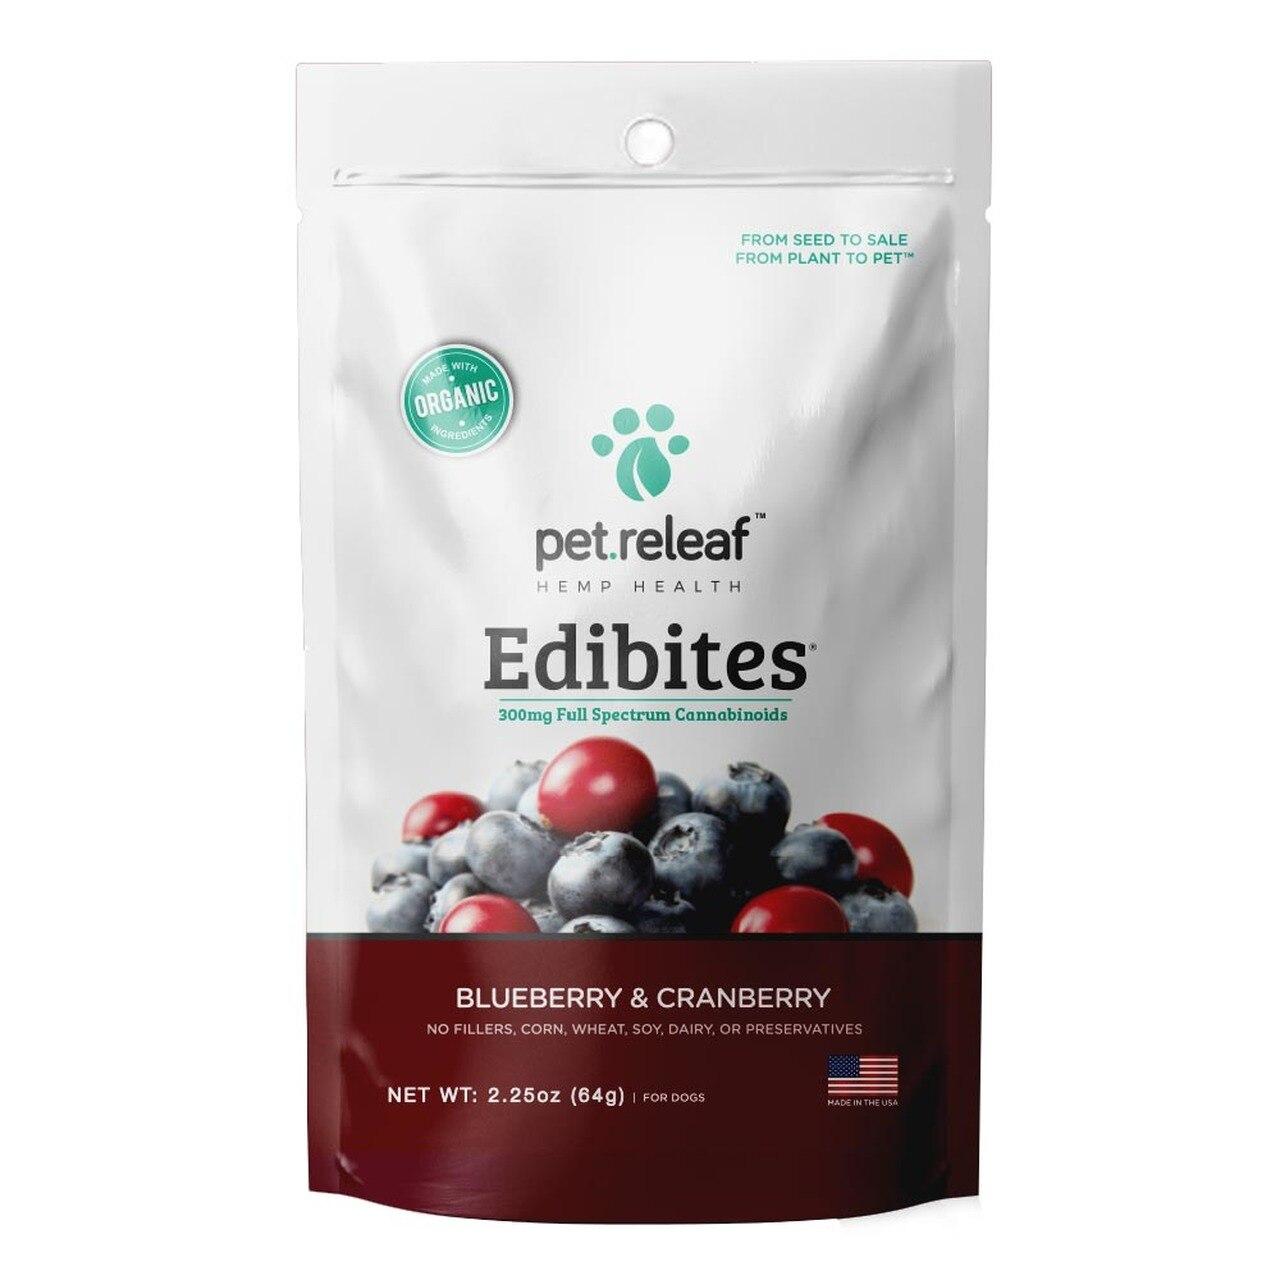 Pet Releaf Edibites Blueberry & Cranberry Dog Treats, 2.25-oz